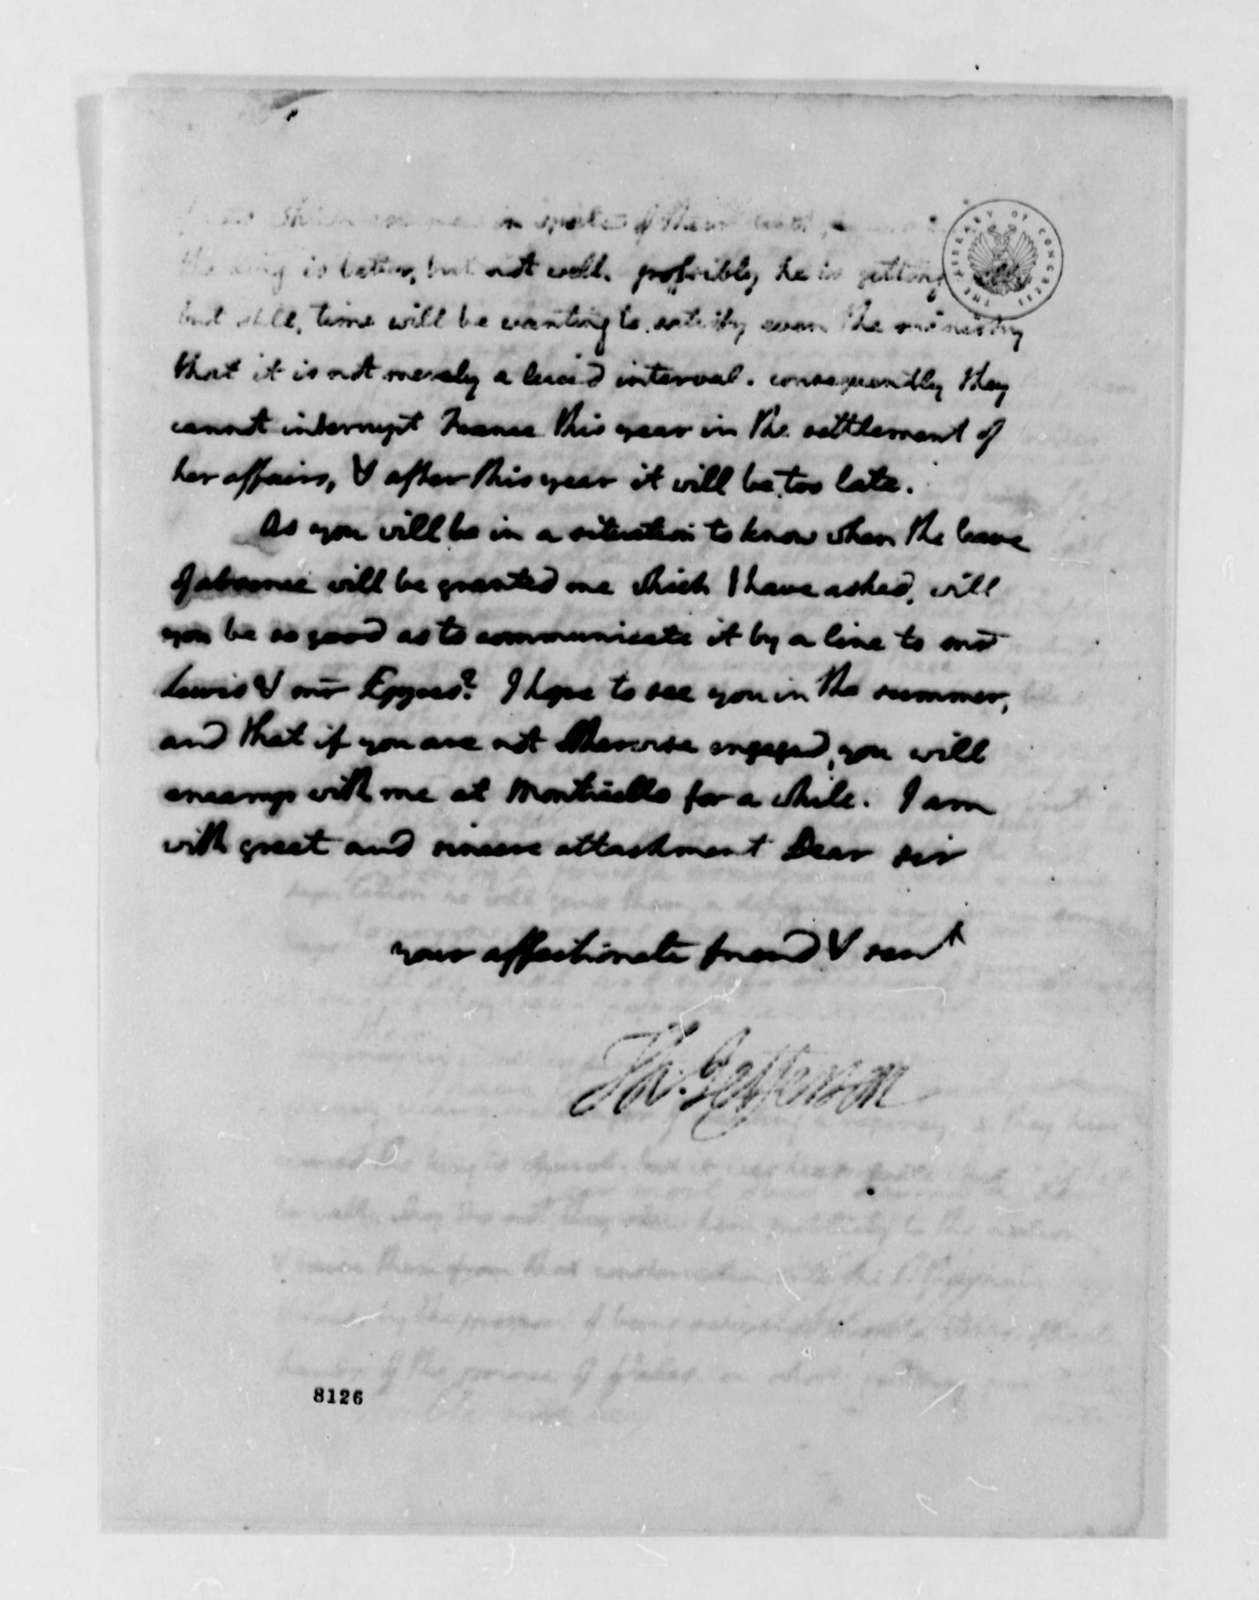 Thomas Jefferson to James Madison, March 15, 1789